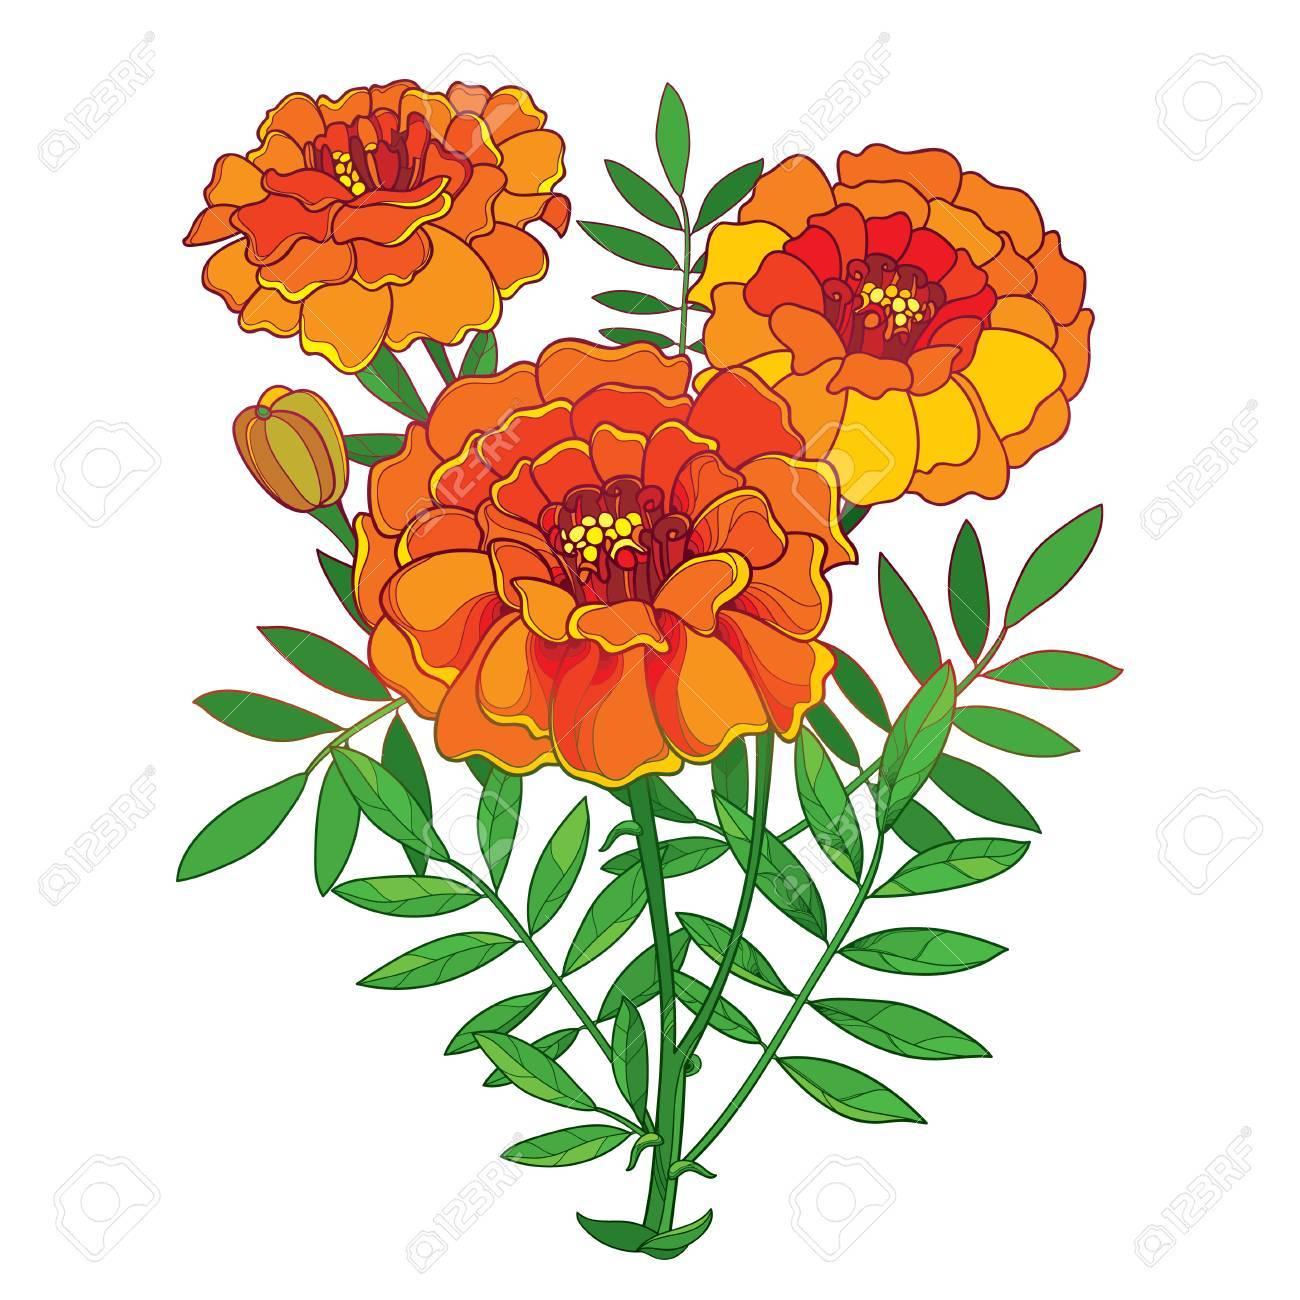 Marigold flower clipart 6 » Clipart Portal.